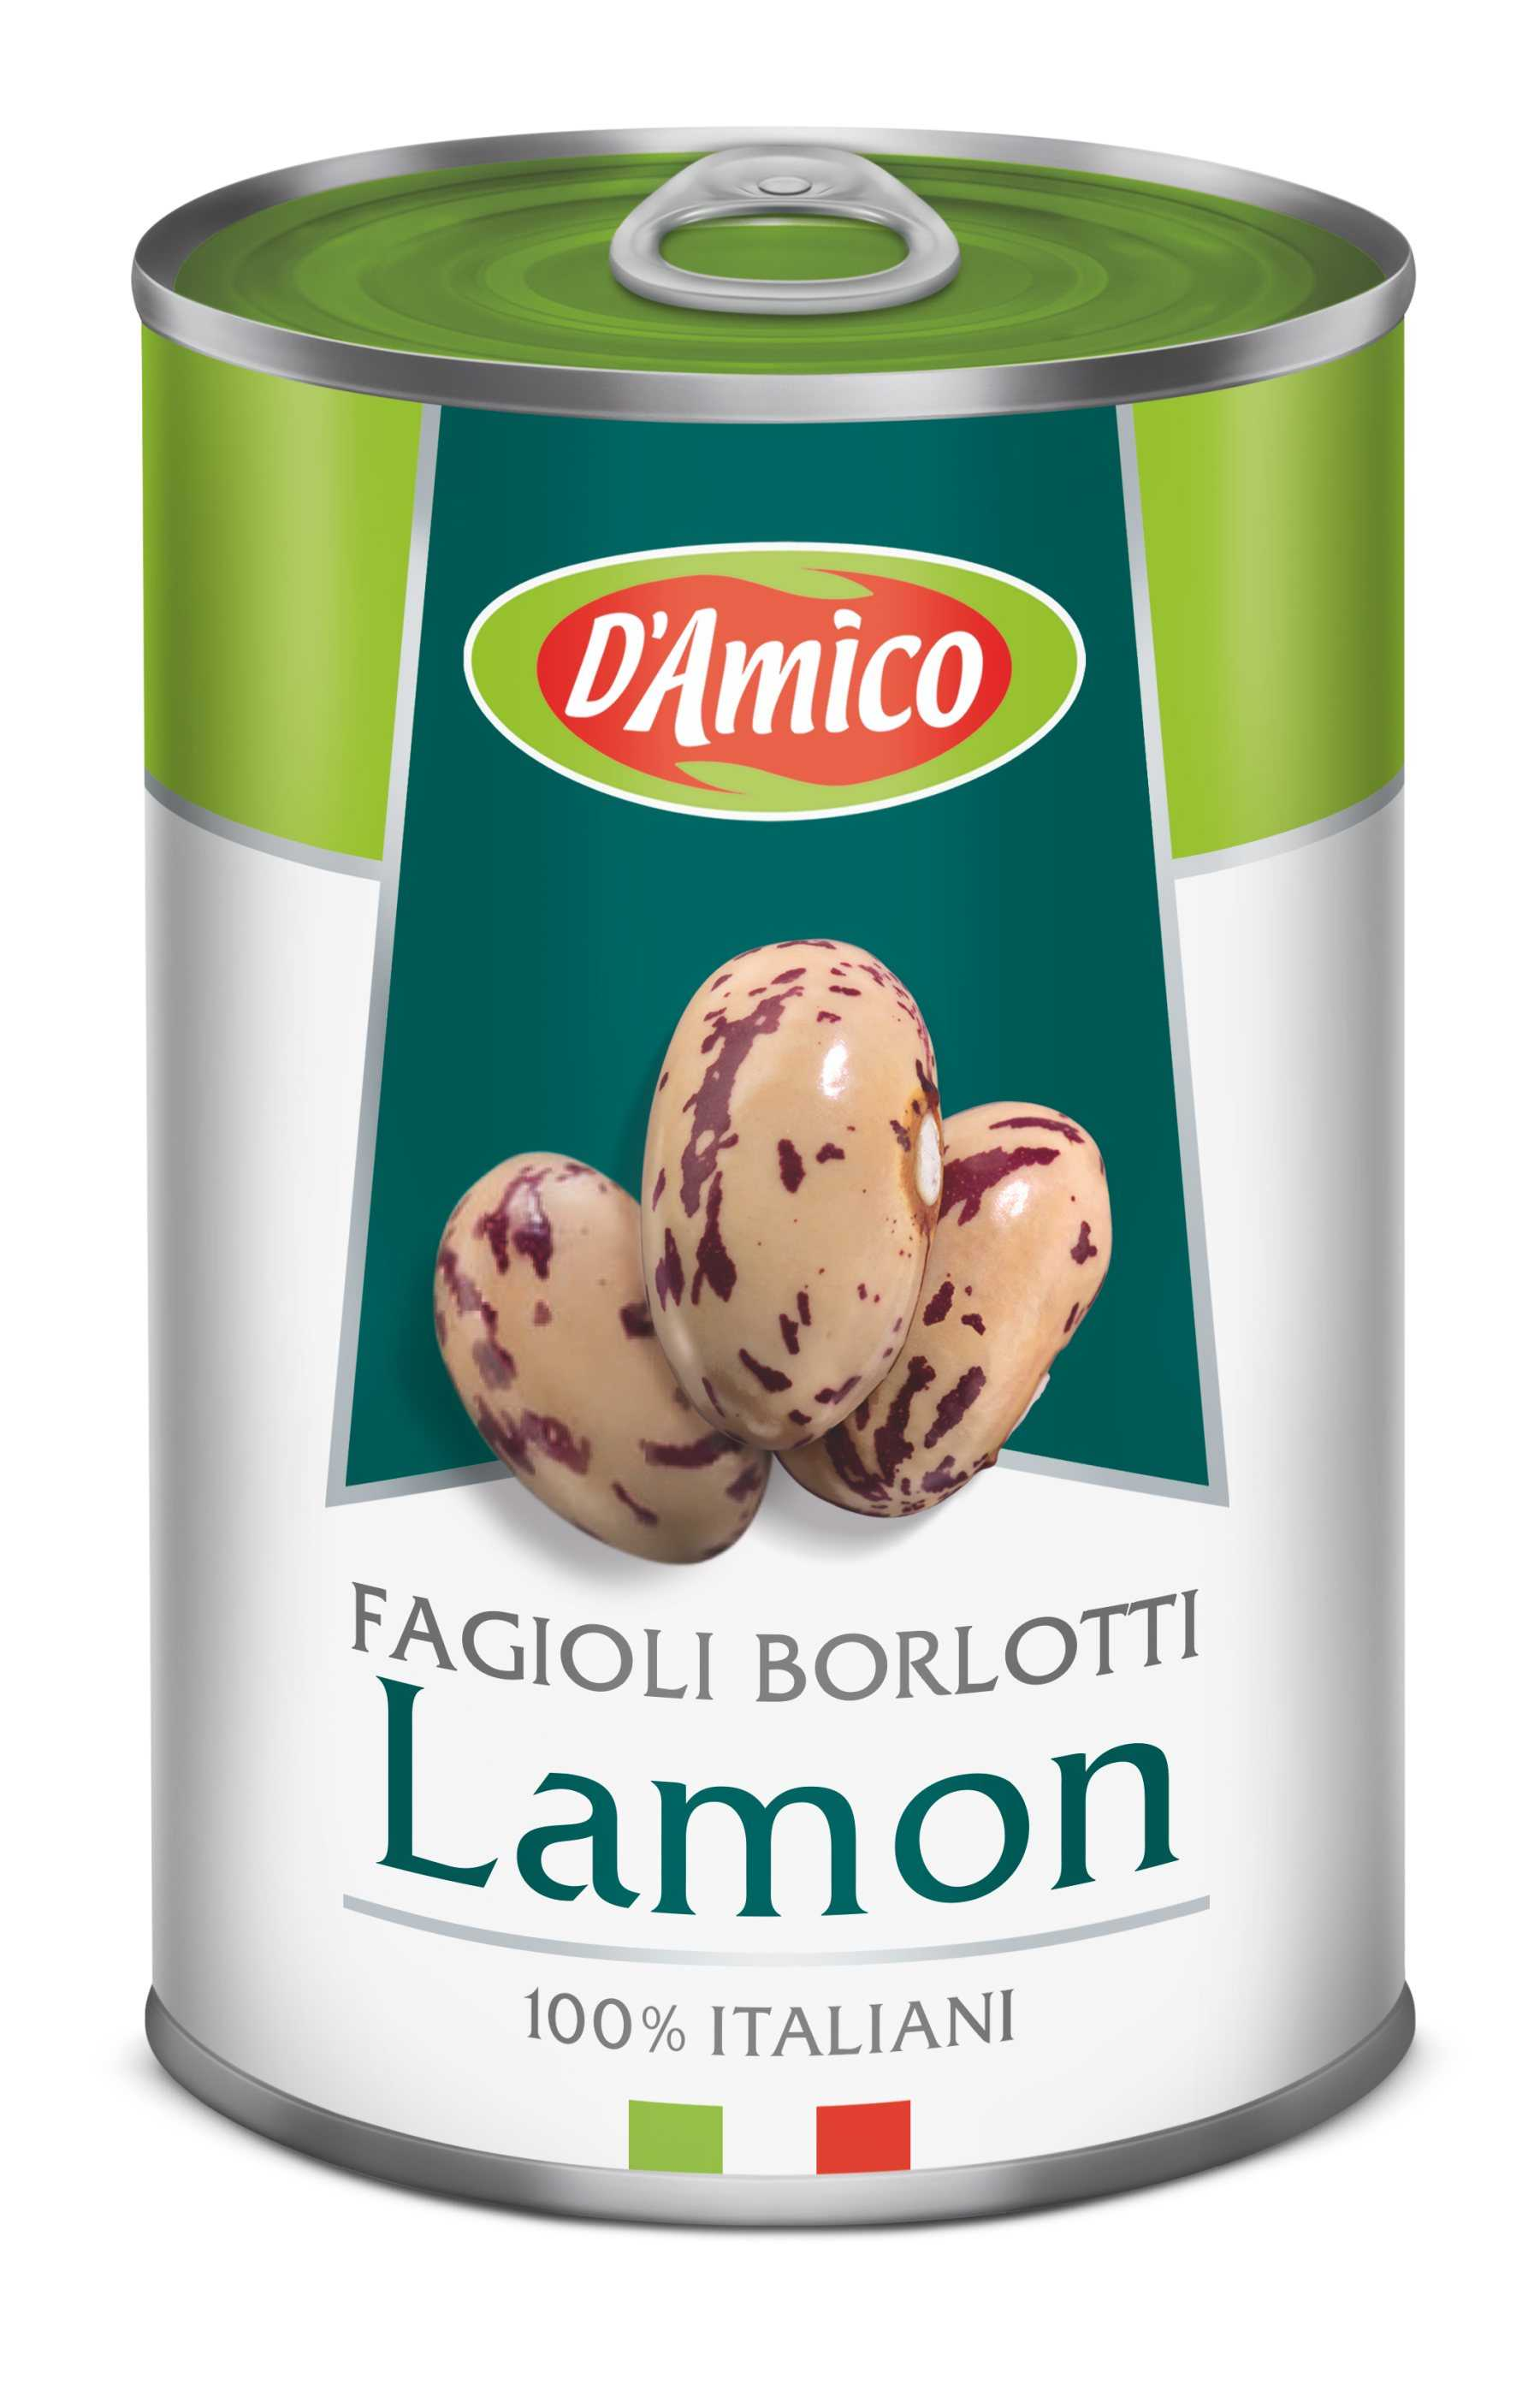 Fagioli Borlotti Lamon